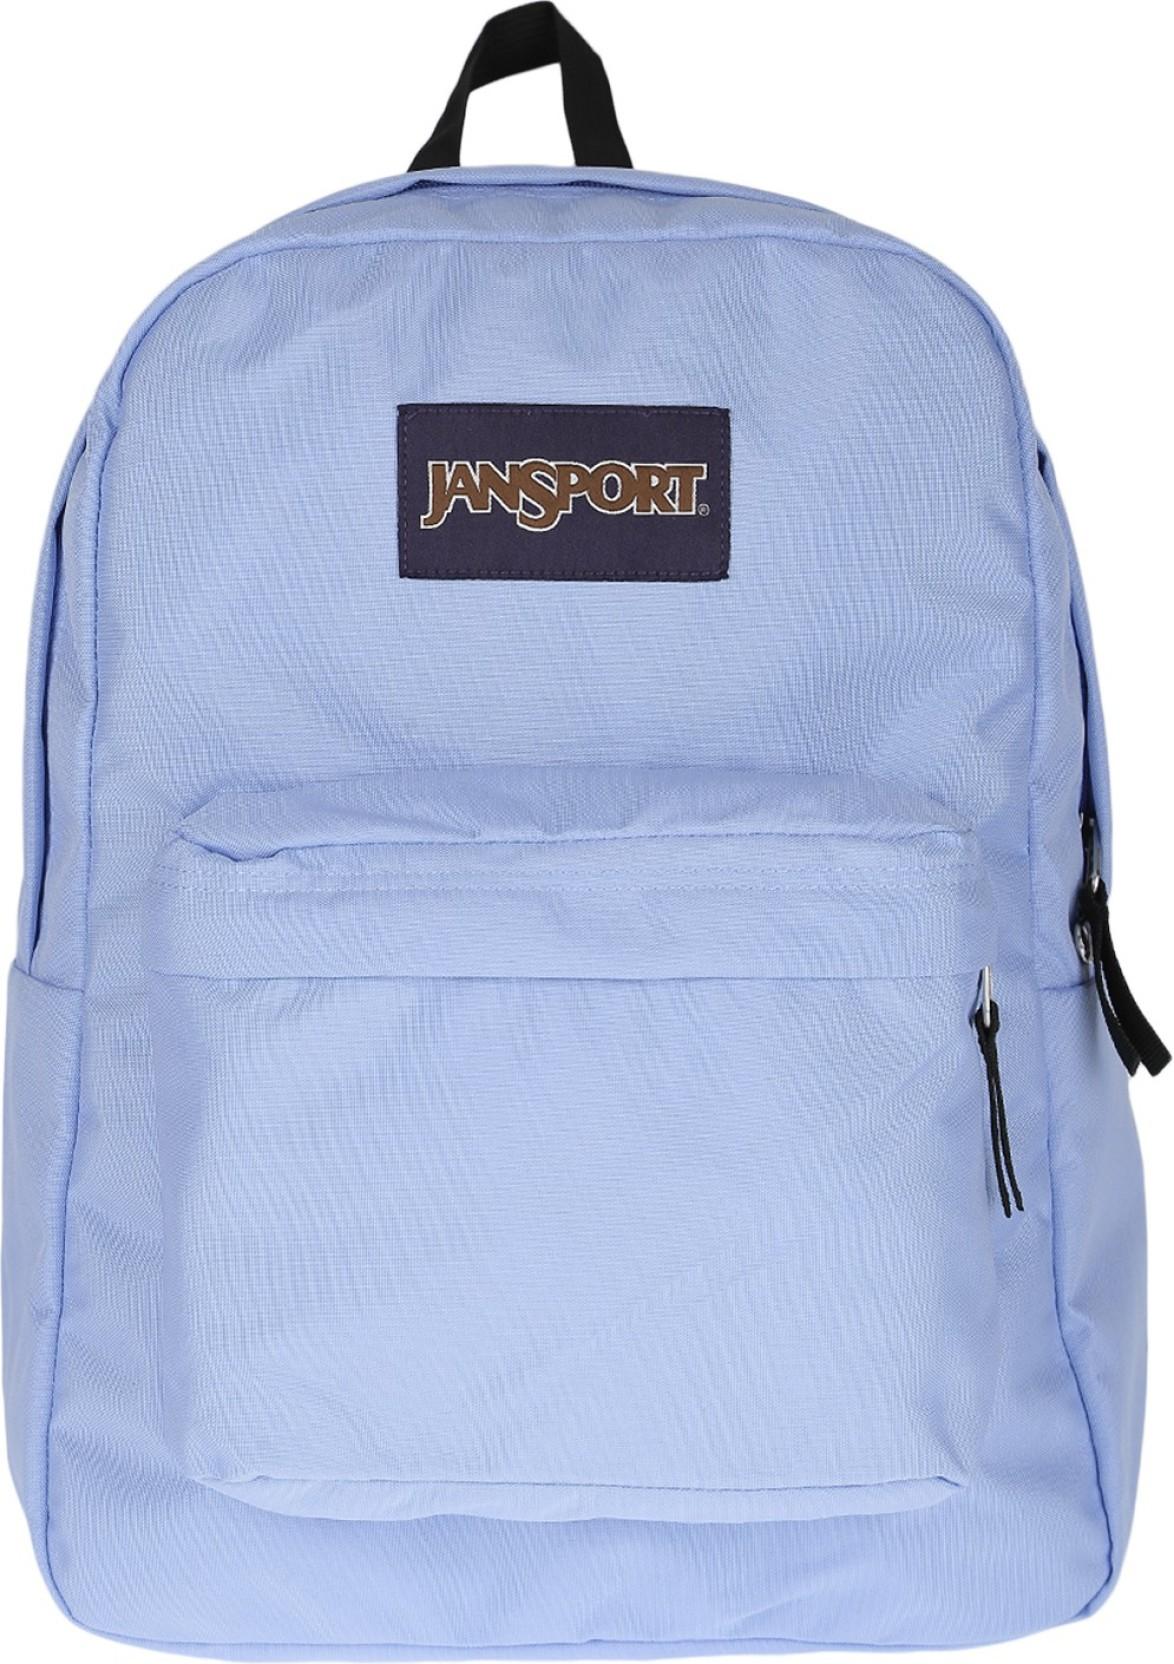 Jansport Backpack Warranty Philippines| Perú Gustoso